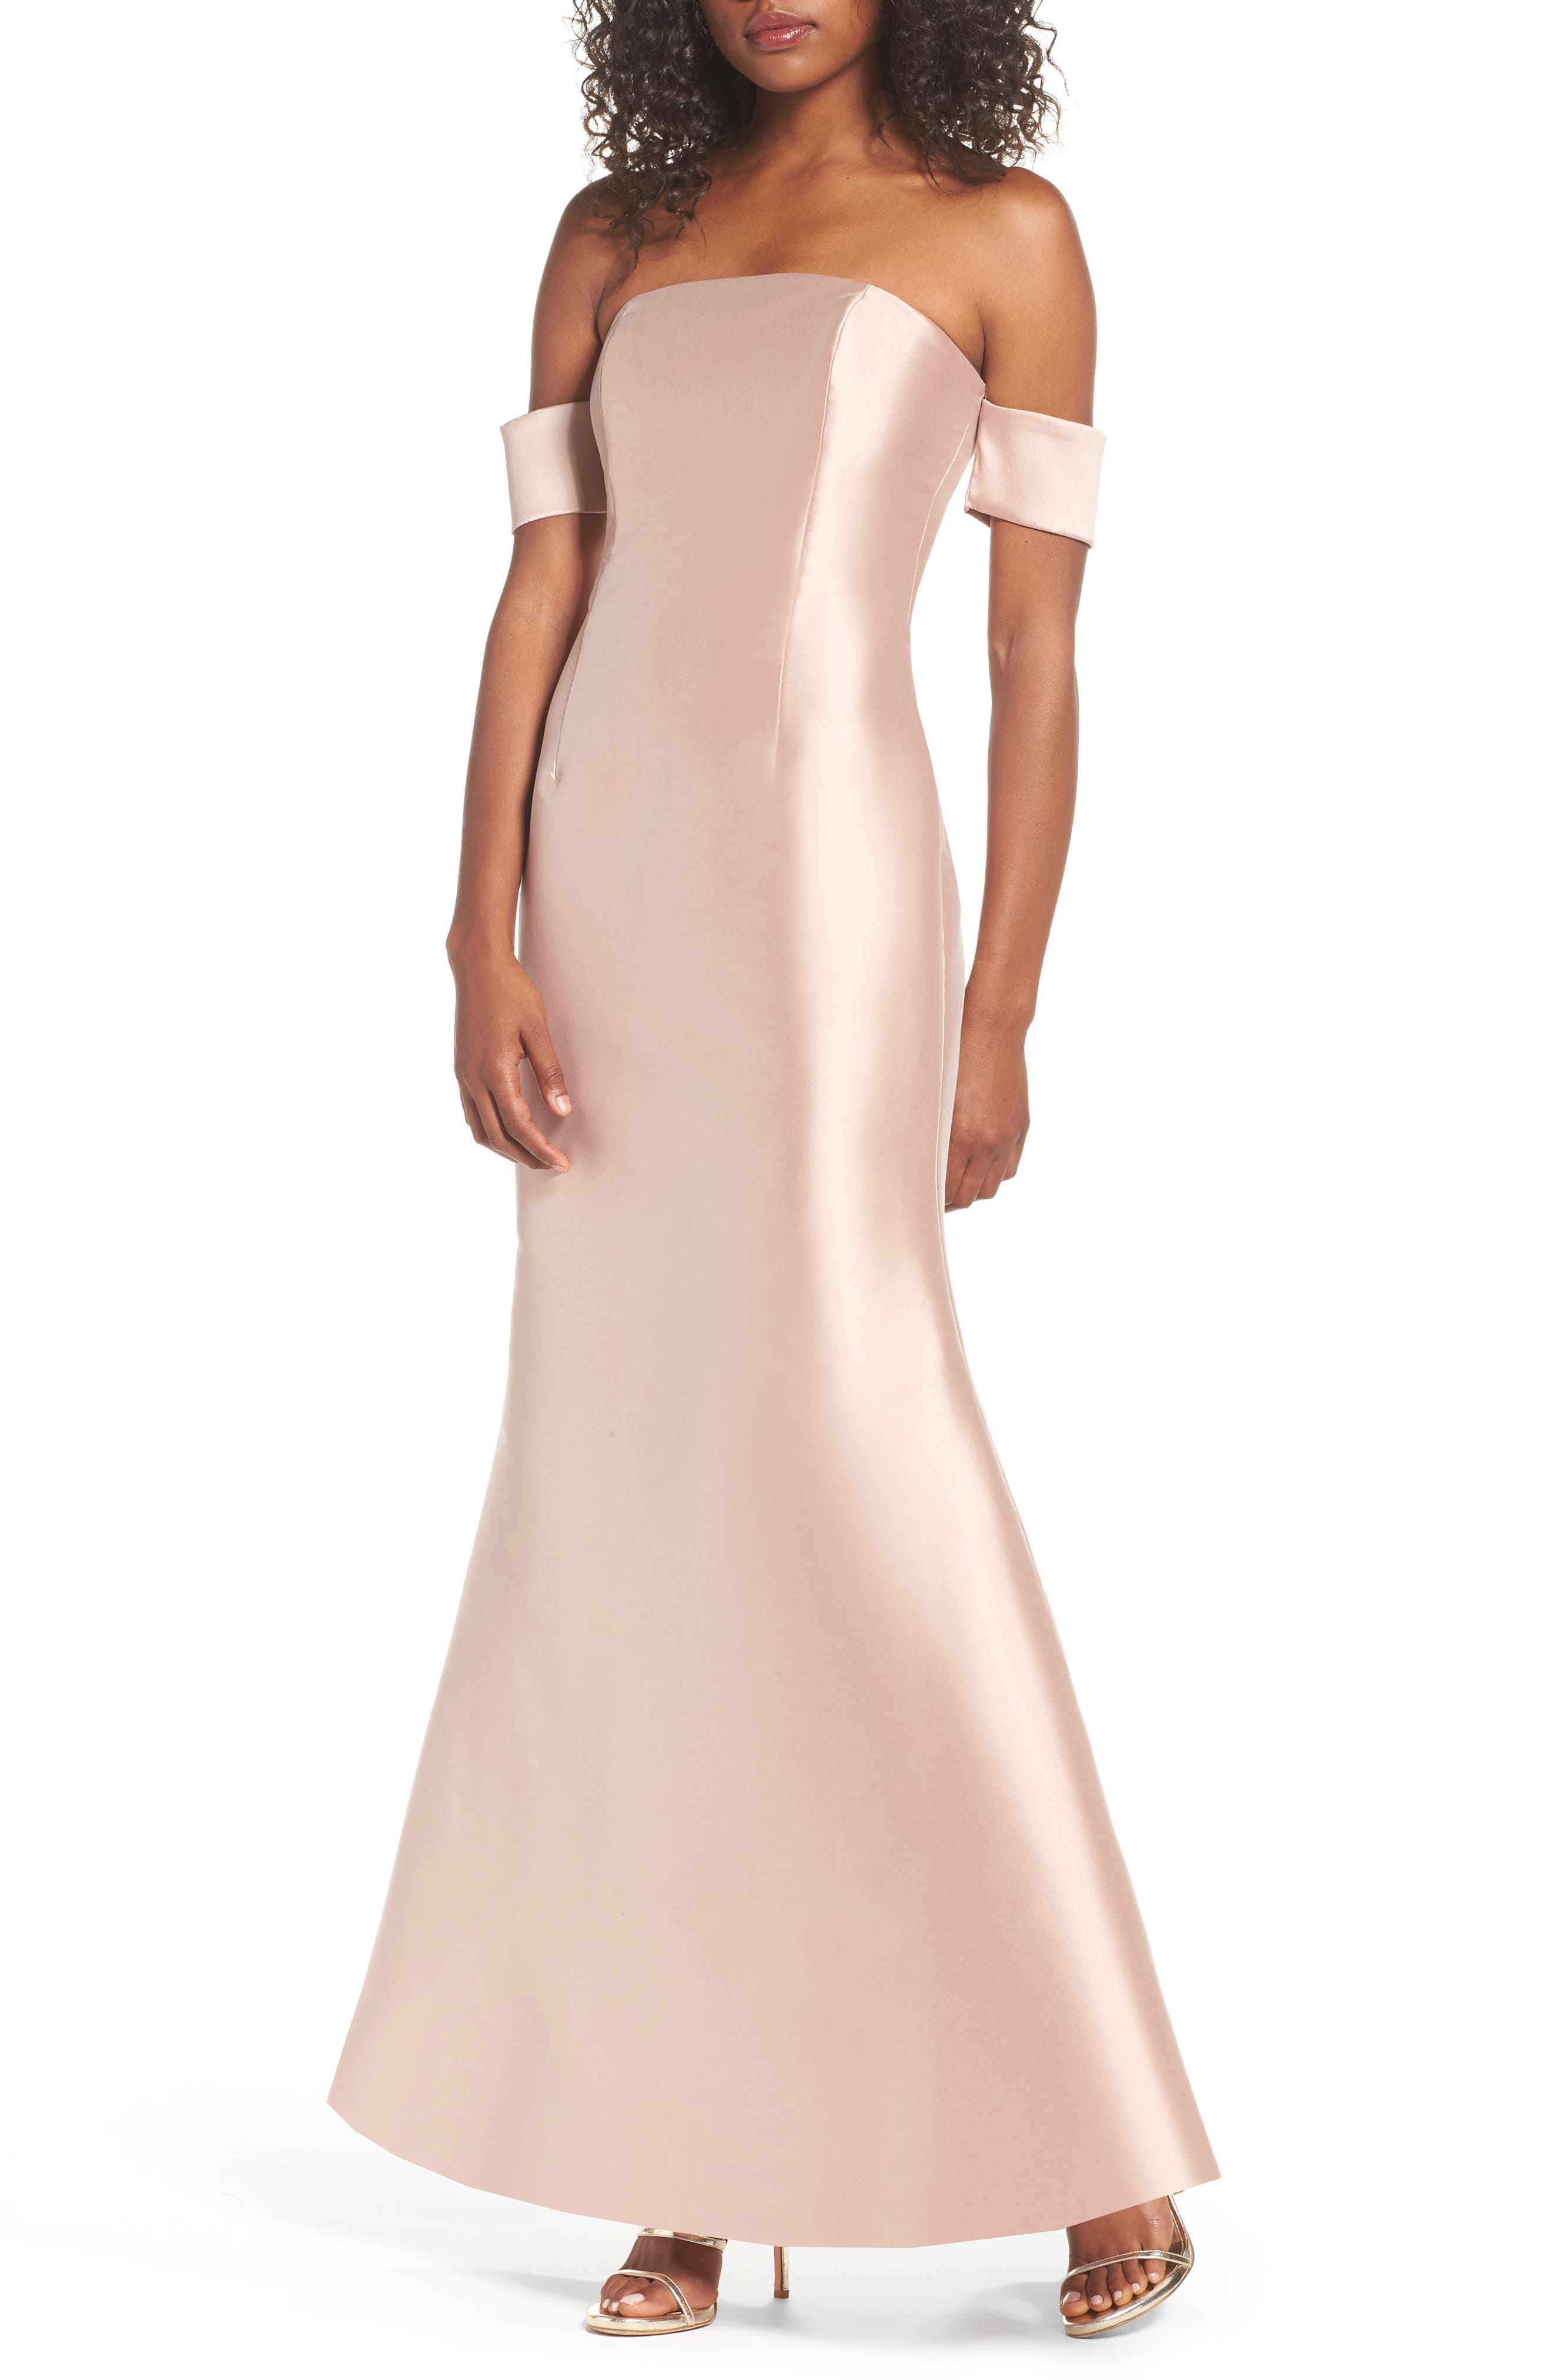 Alternate Image 1 Selected - Sachin & Babi Noir Victoria Mermaid Gown